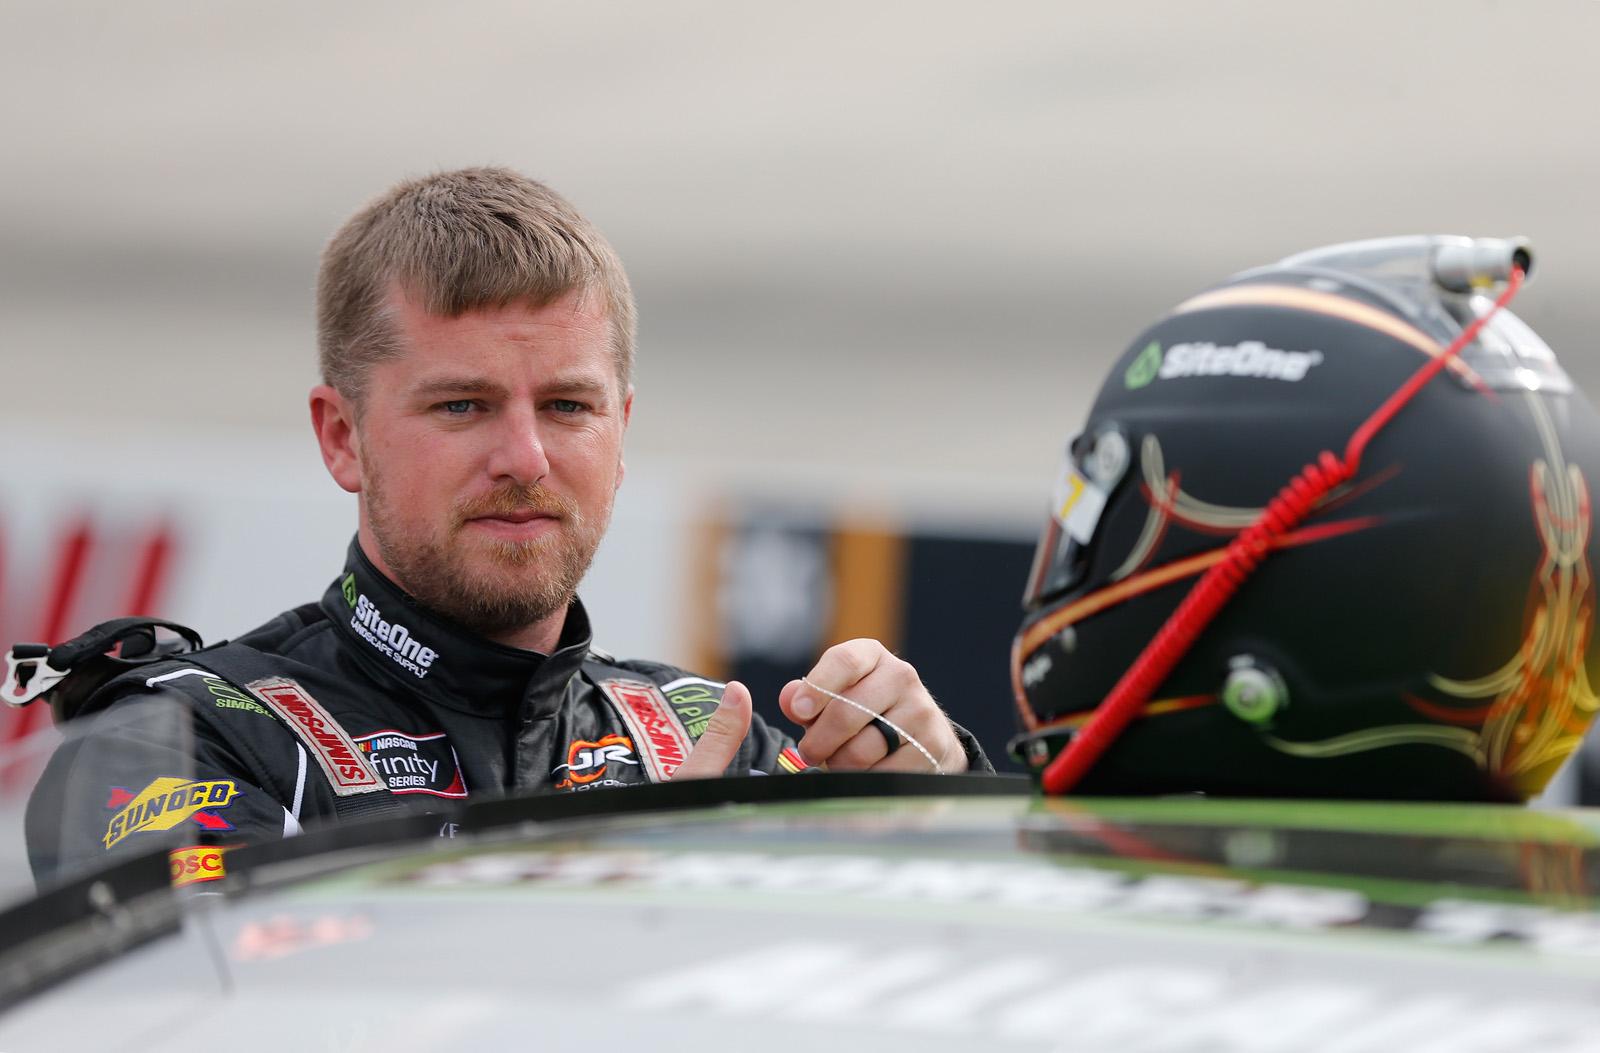 NASCAR Xfinity Series OneMain Financial 200 – Qualifying